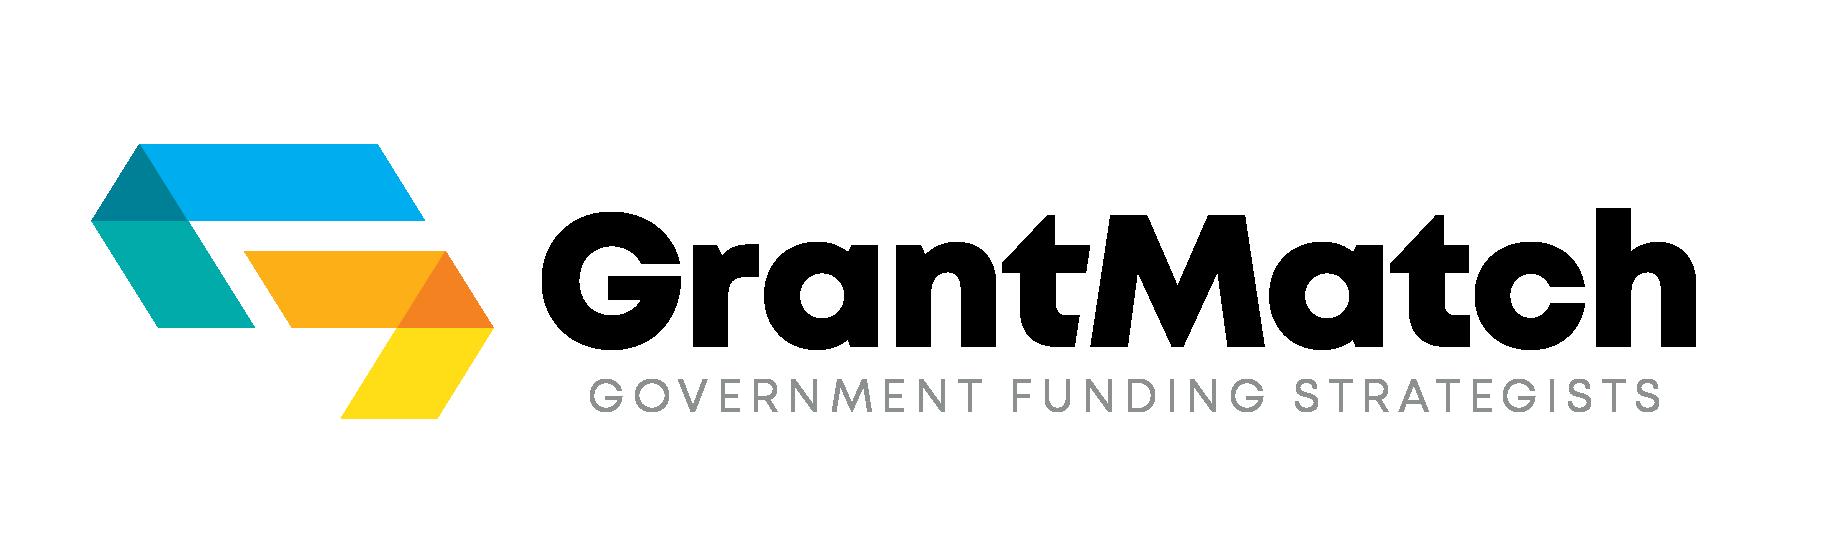 governmentfundingstrategistsfinal-01